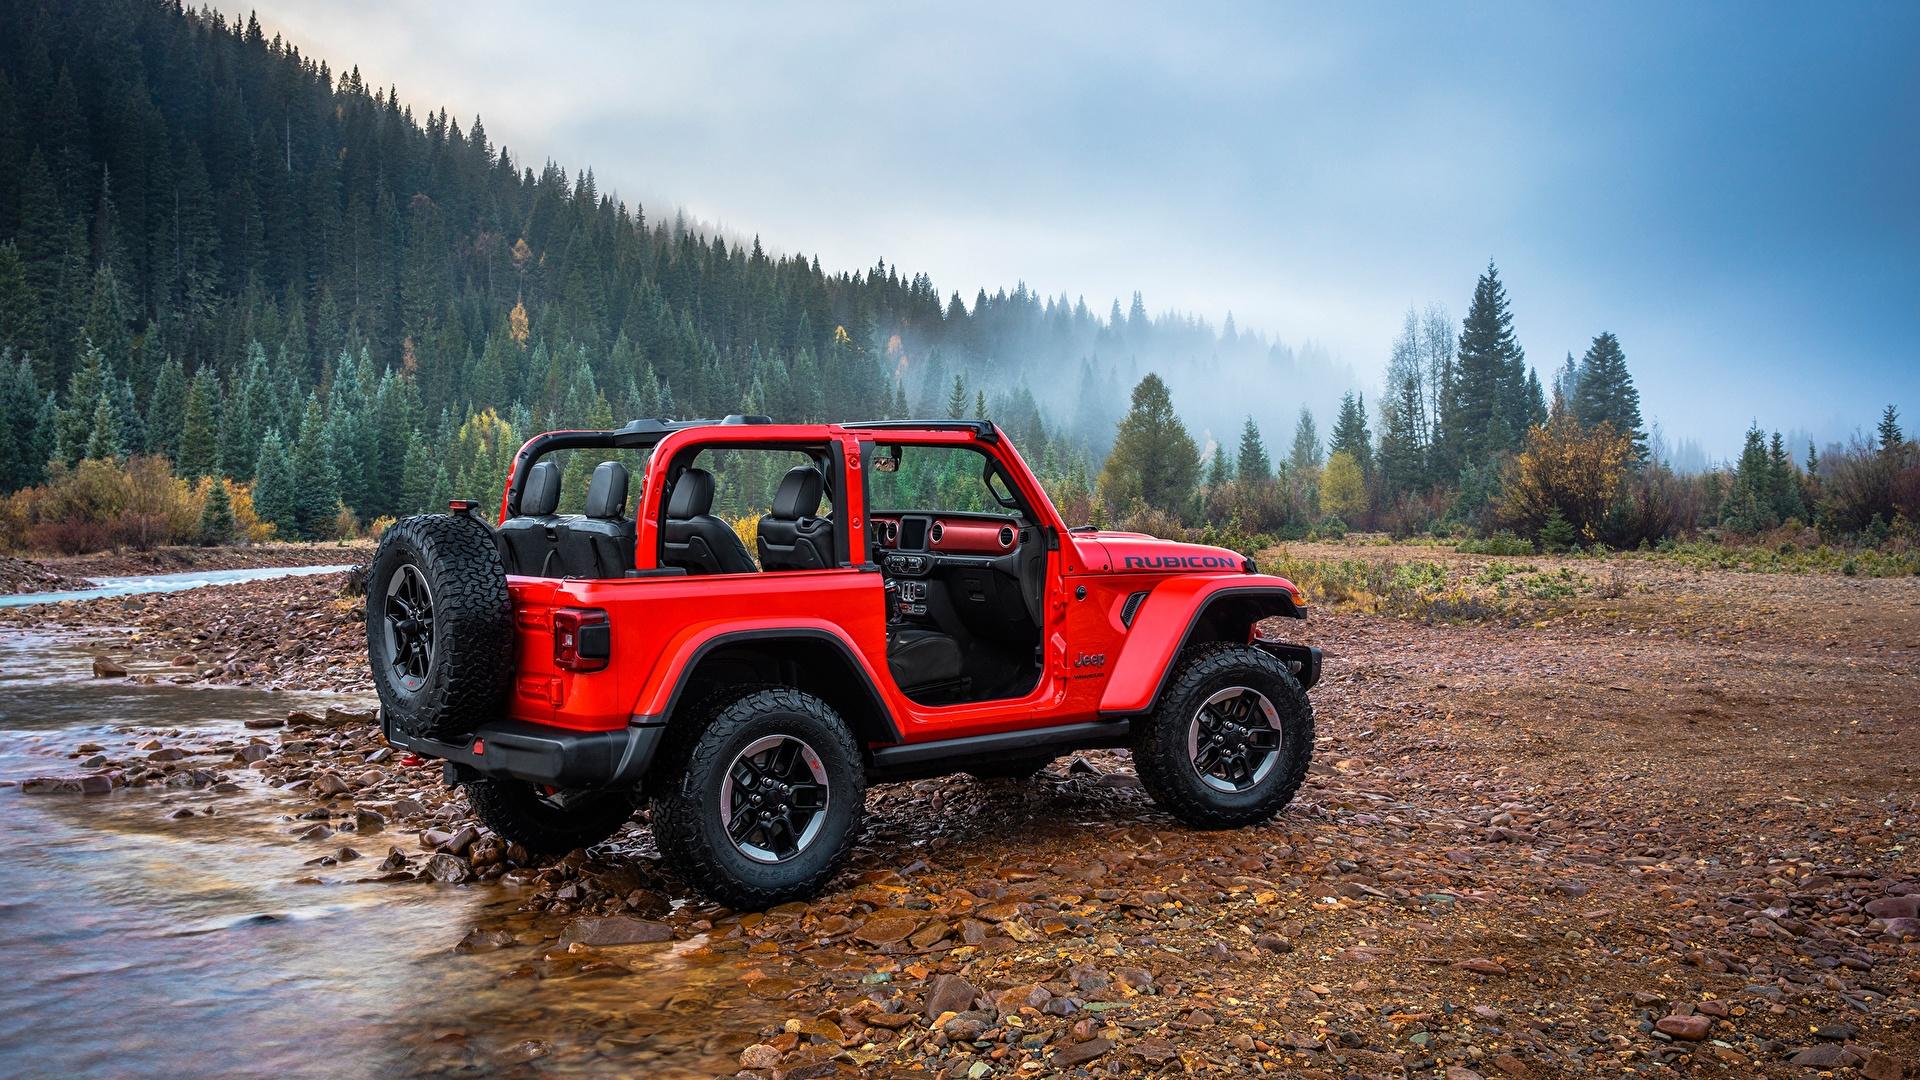 Picture Jeep SUV Wrangler Rubicon, 2018 Red Stones Rivers automobile 1920x1080 Sport utility vehicle Cars auto stone river